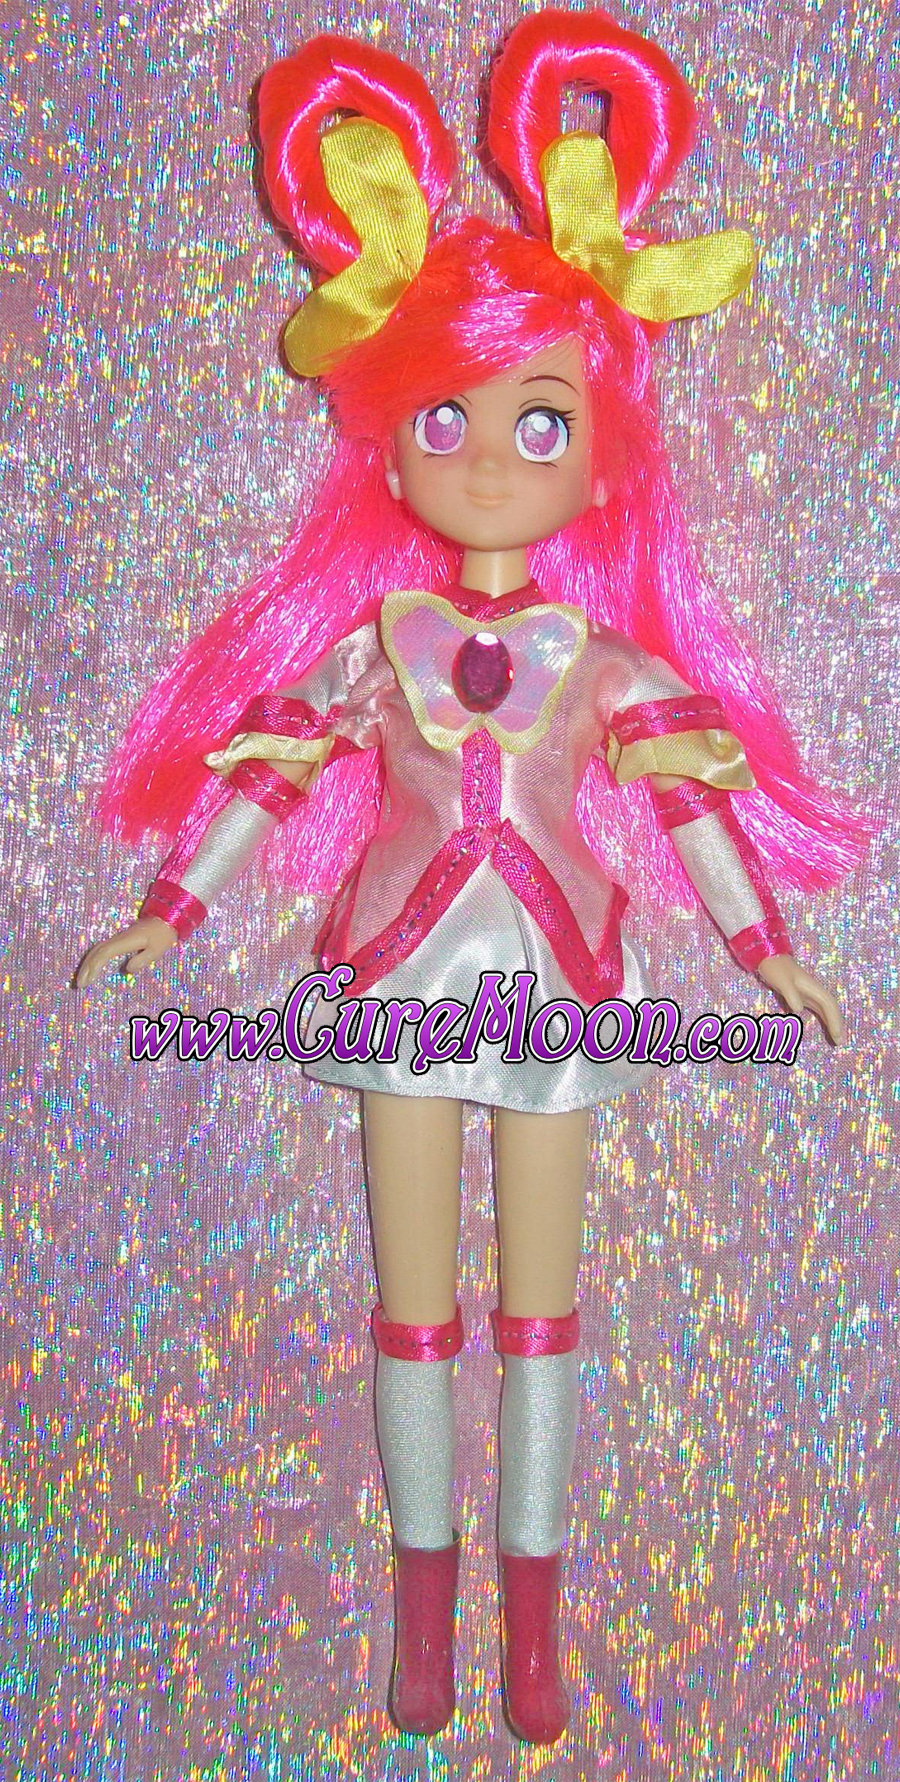 cure-dream-bambola-doll-custom-ooak-handmade-yes-pretty-cure-5-bunnytsukino-curemoon